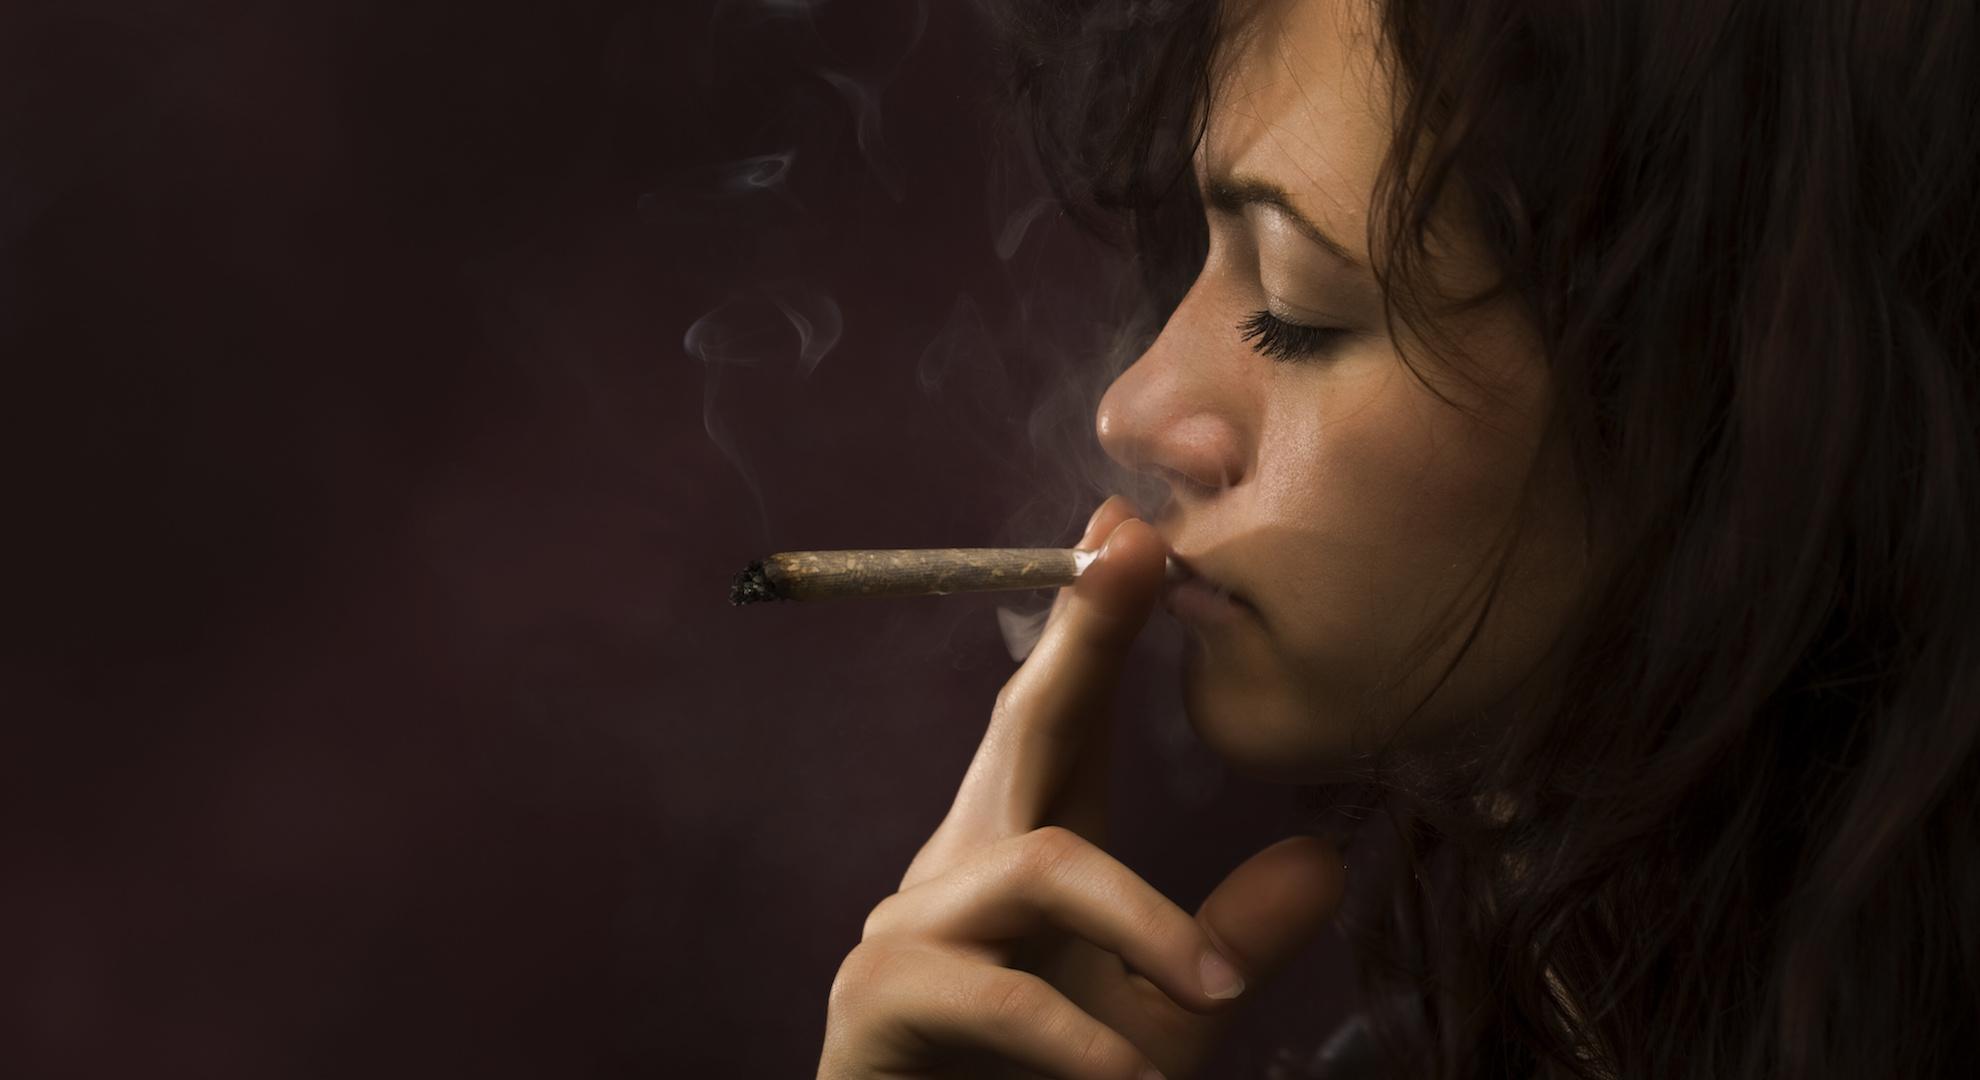 Почему девушки курят?